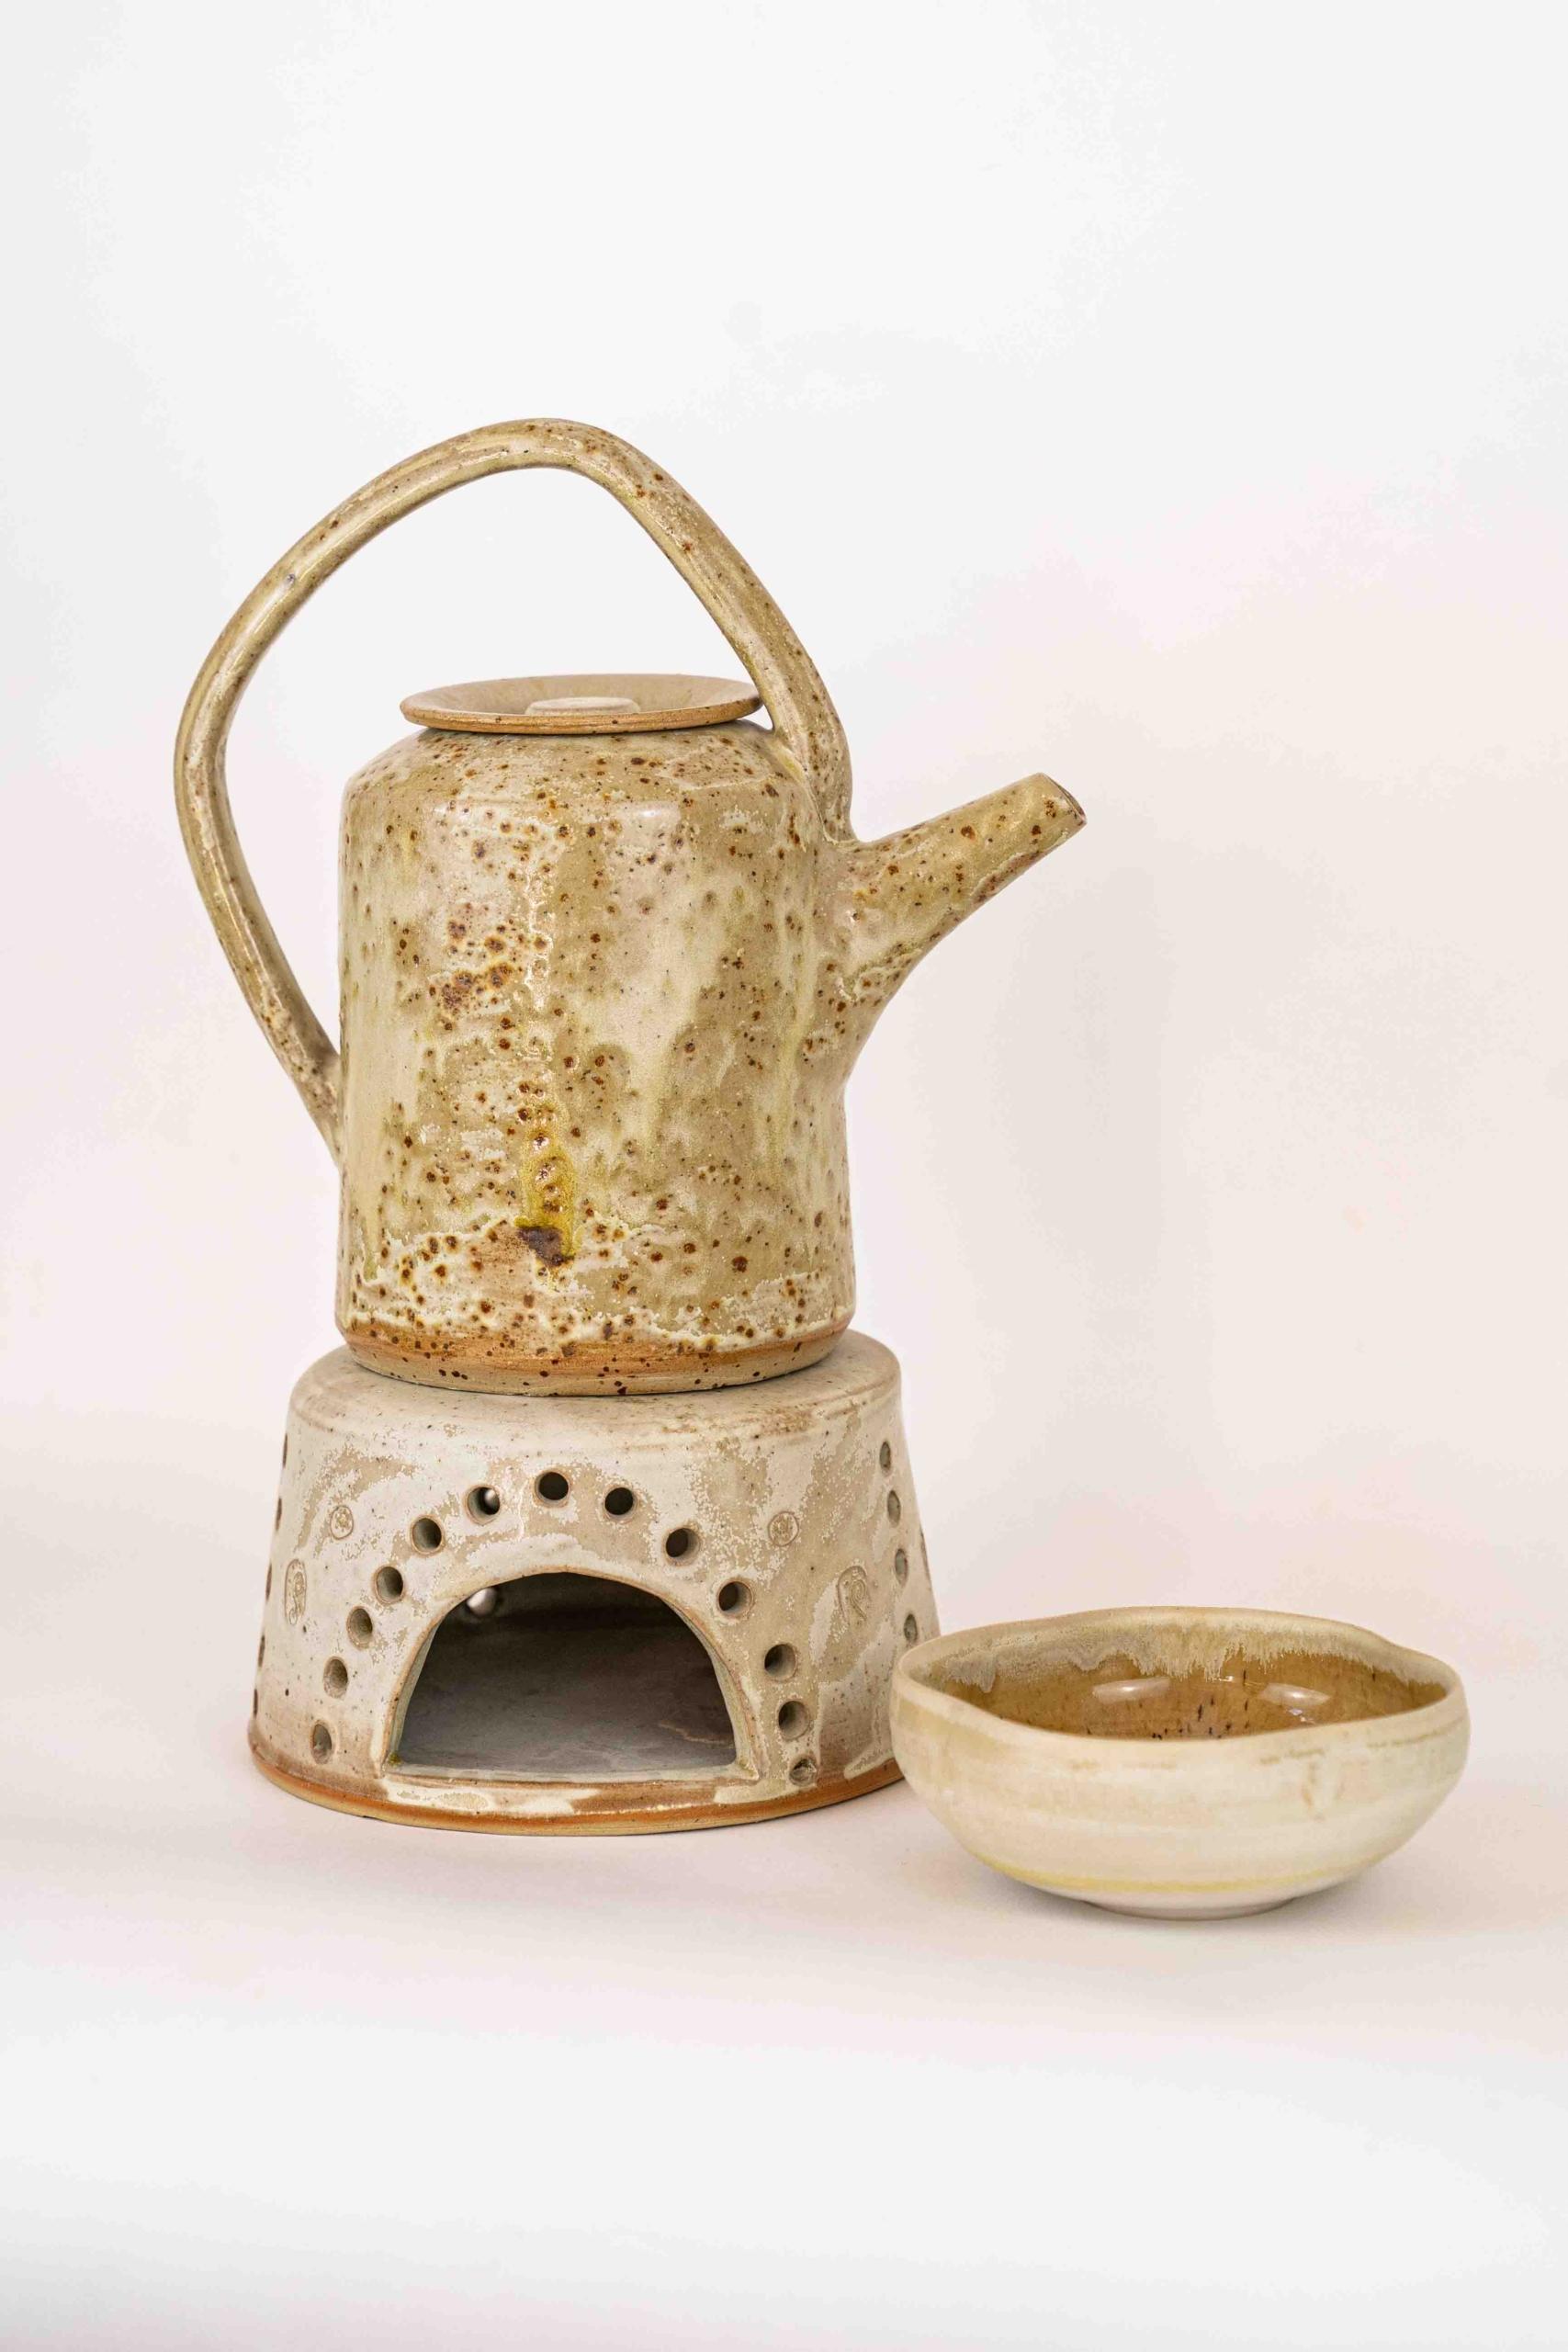 Teekanne, Stövchen, Teeschale